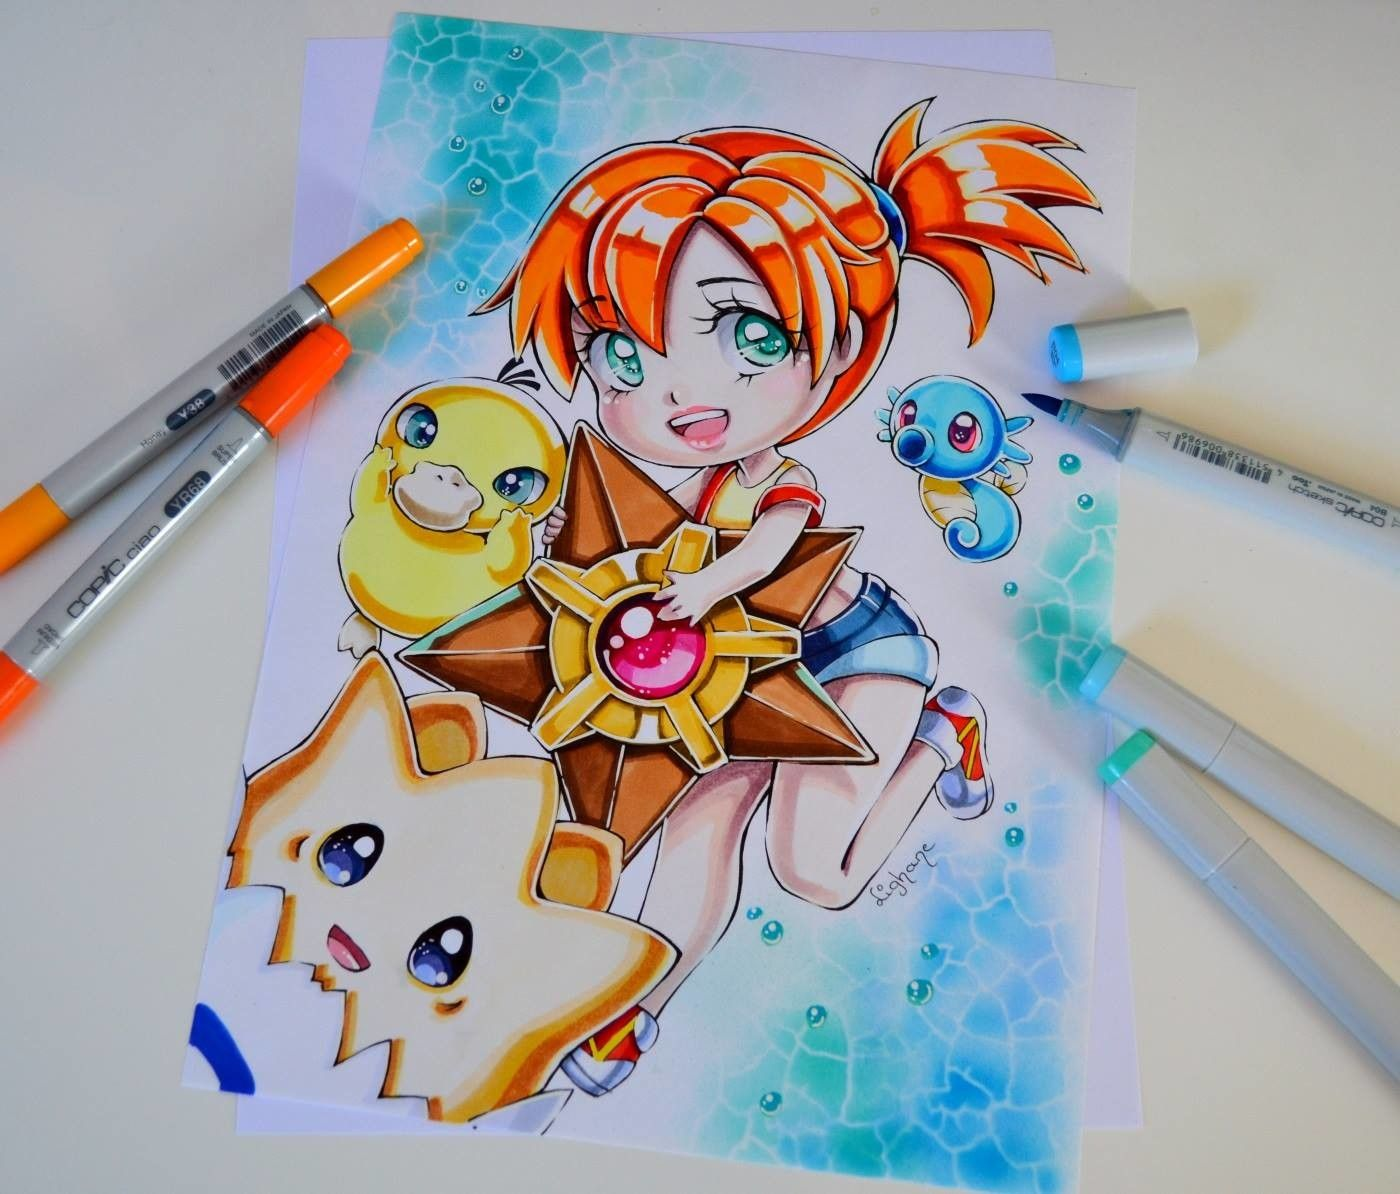 Misty / Pokémon / Copic Marker, Lighane's Artblog (With